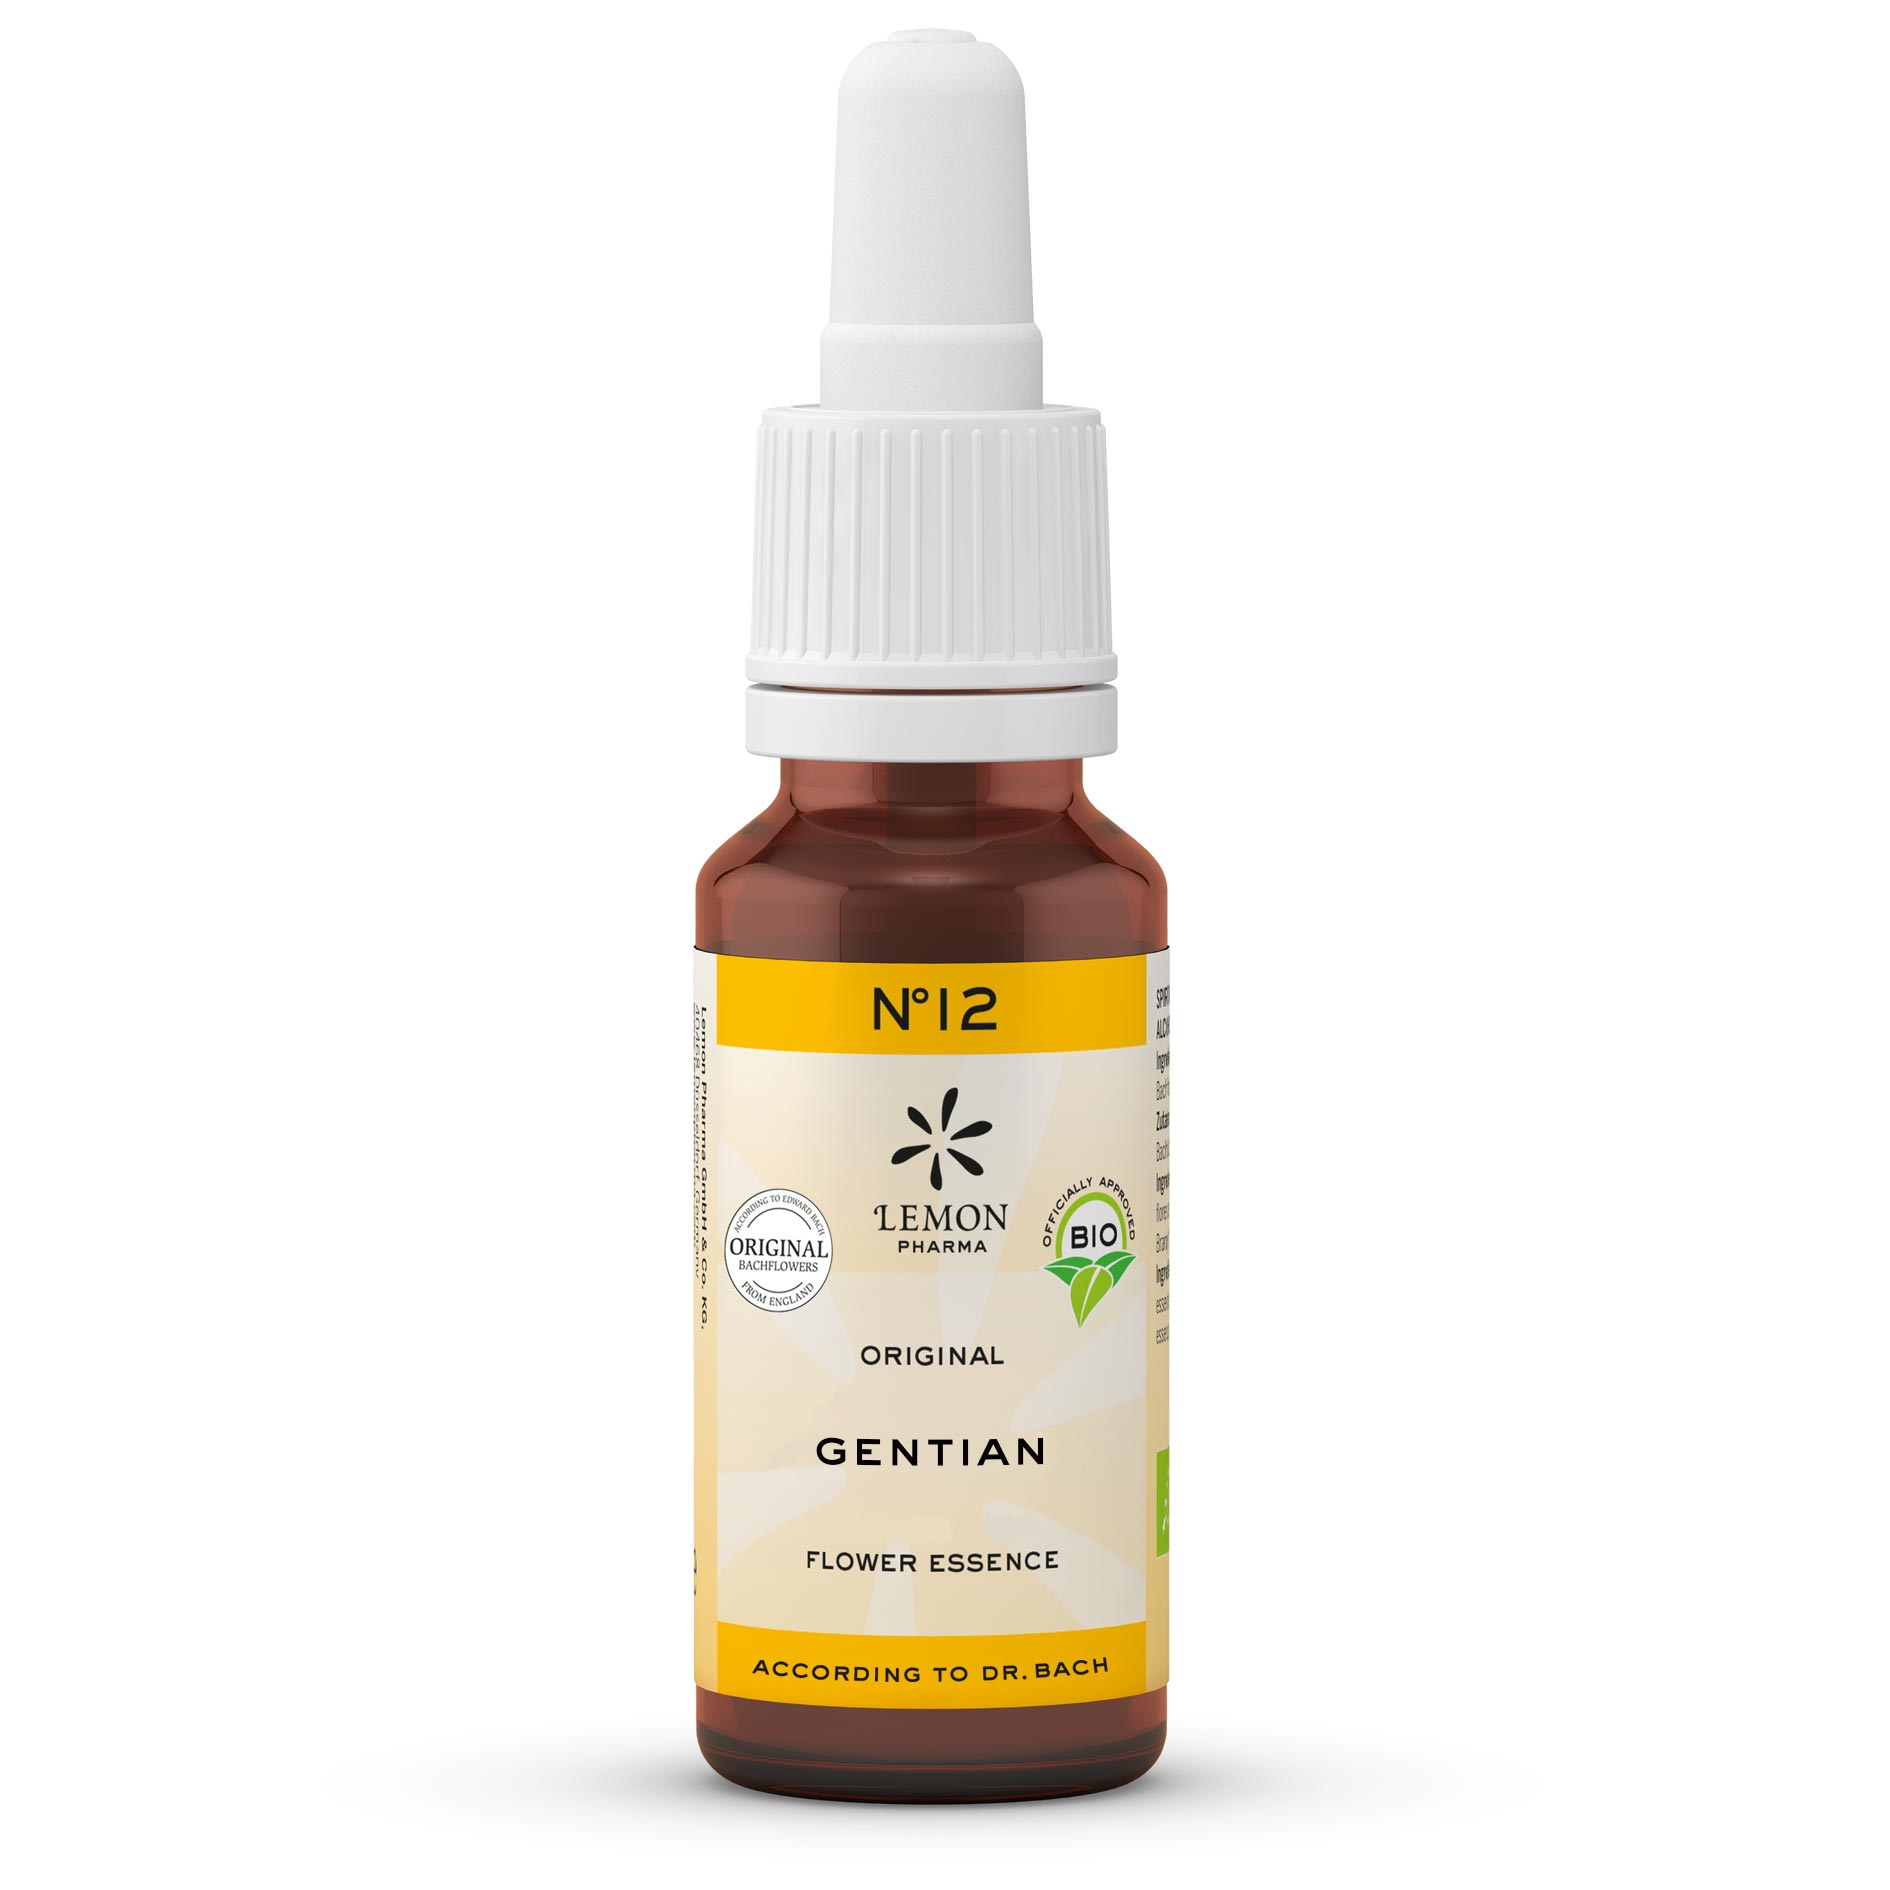 Lemon Pharma Original Bachblüten Tropfen Nr 12 Gentian Herbtenzian Glaubenskraft